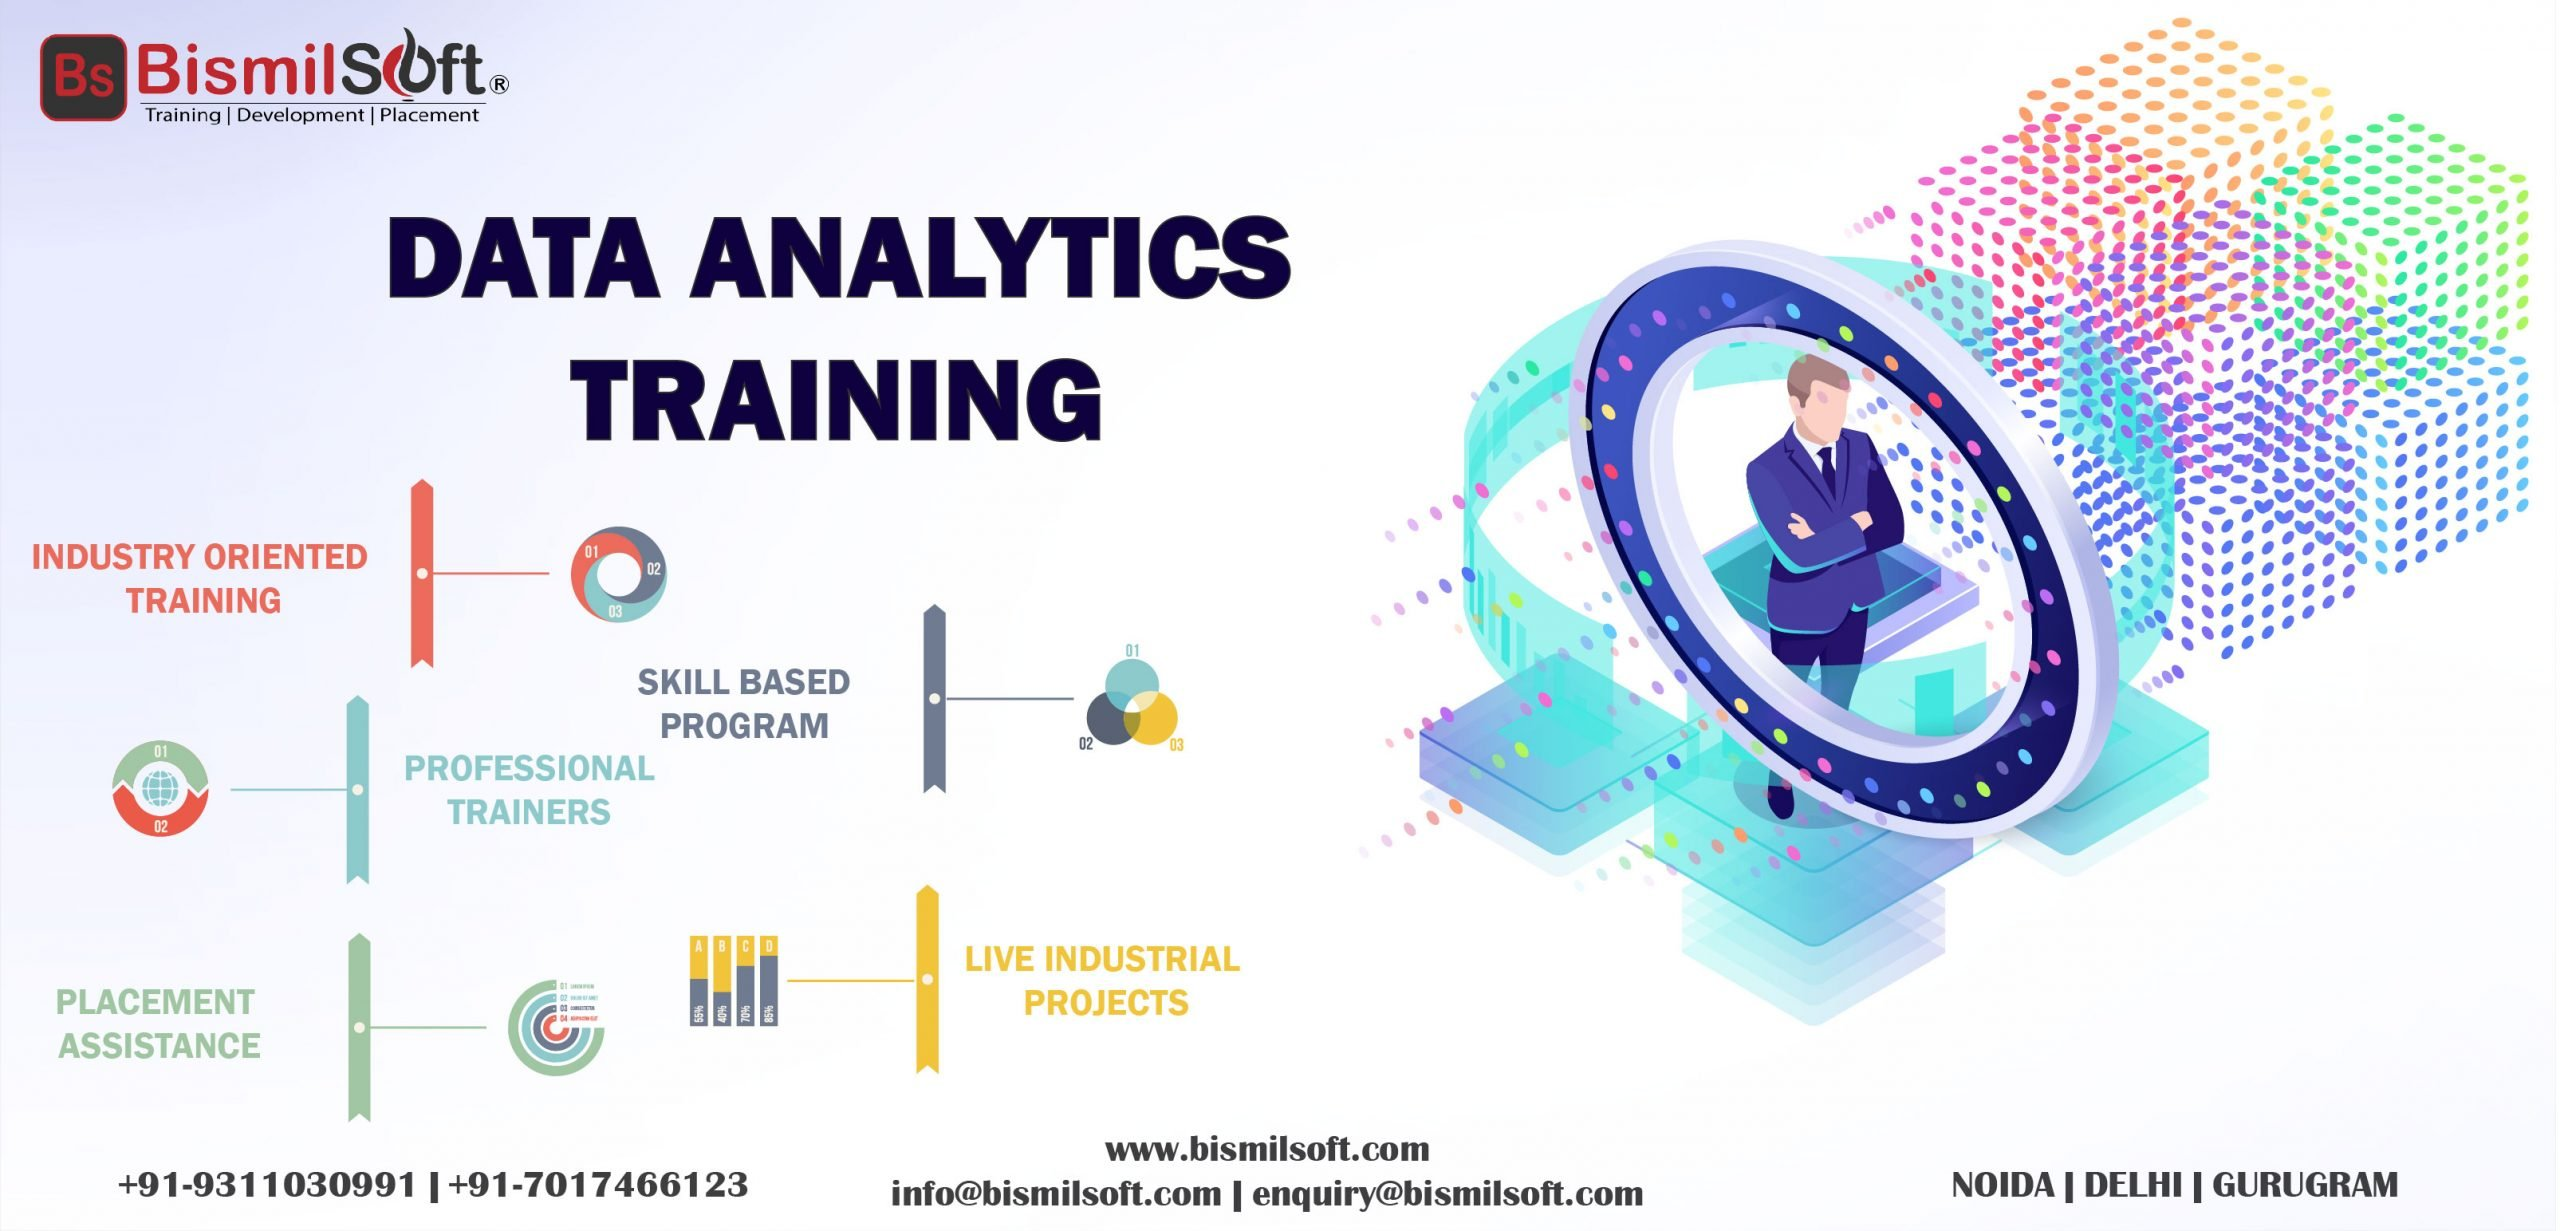 Online Data Analytics Training in India